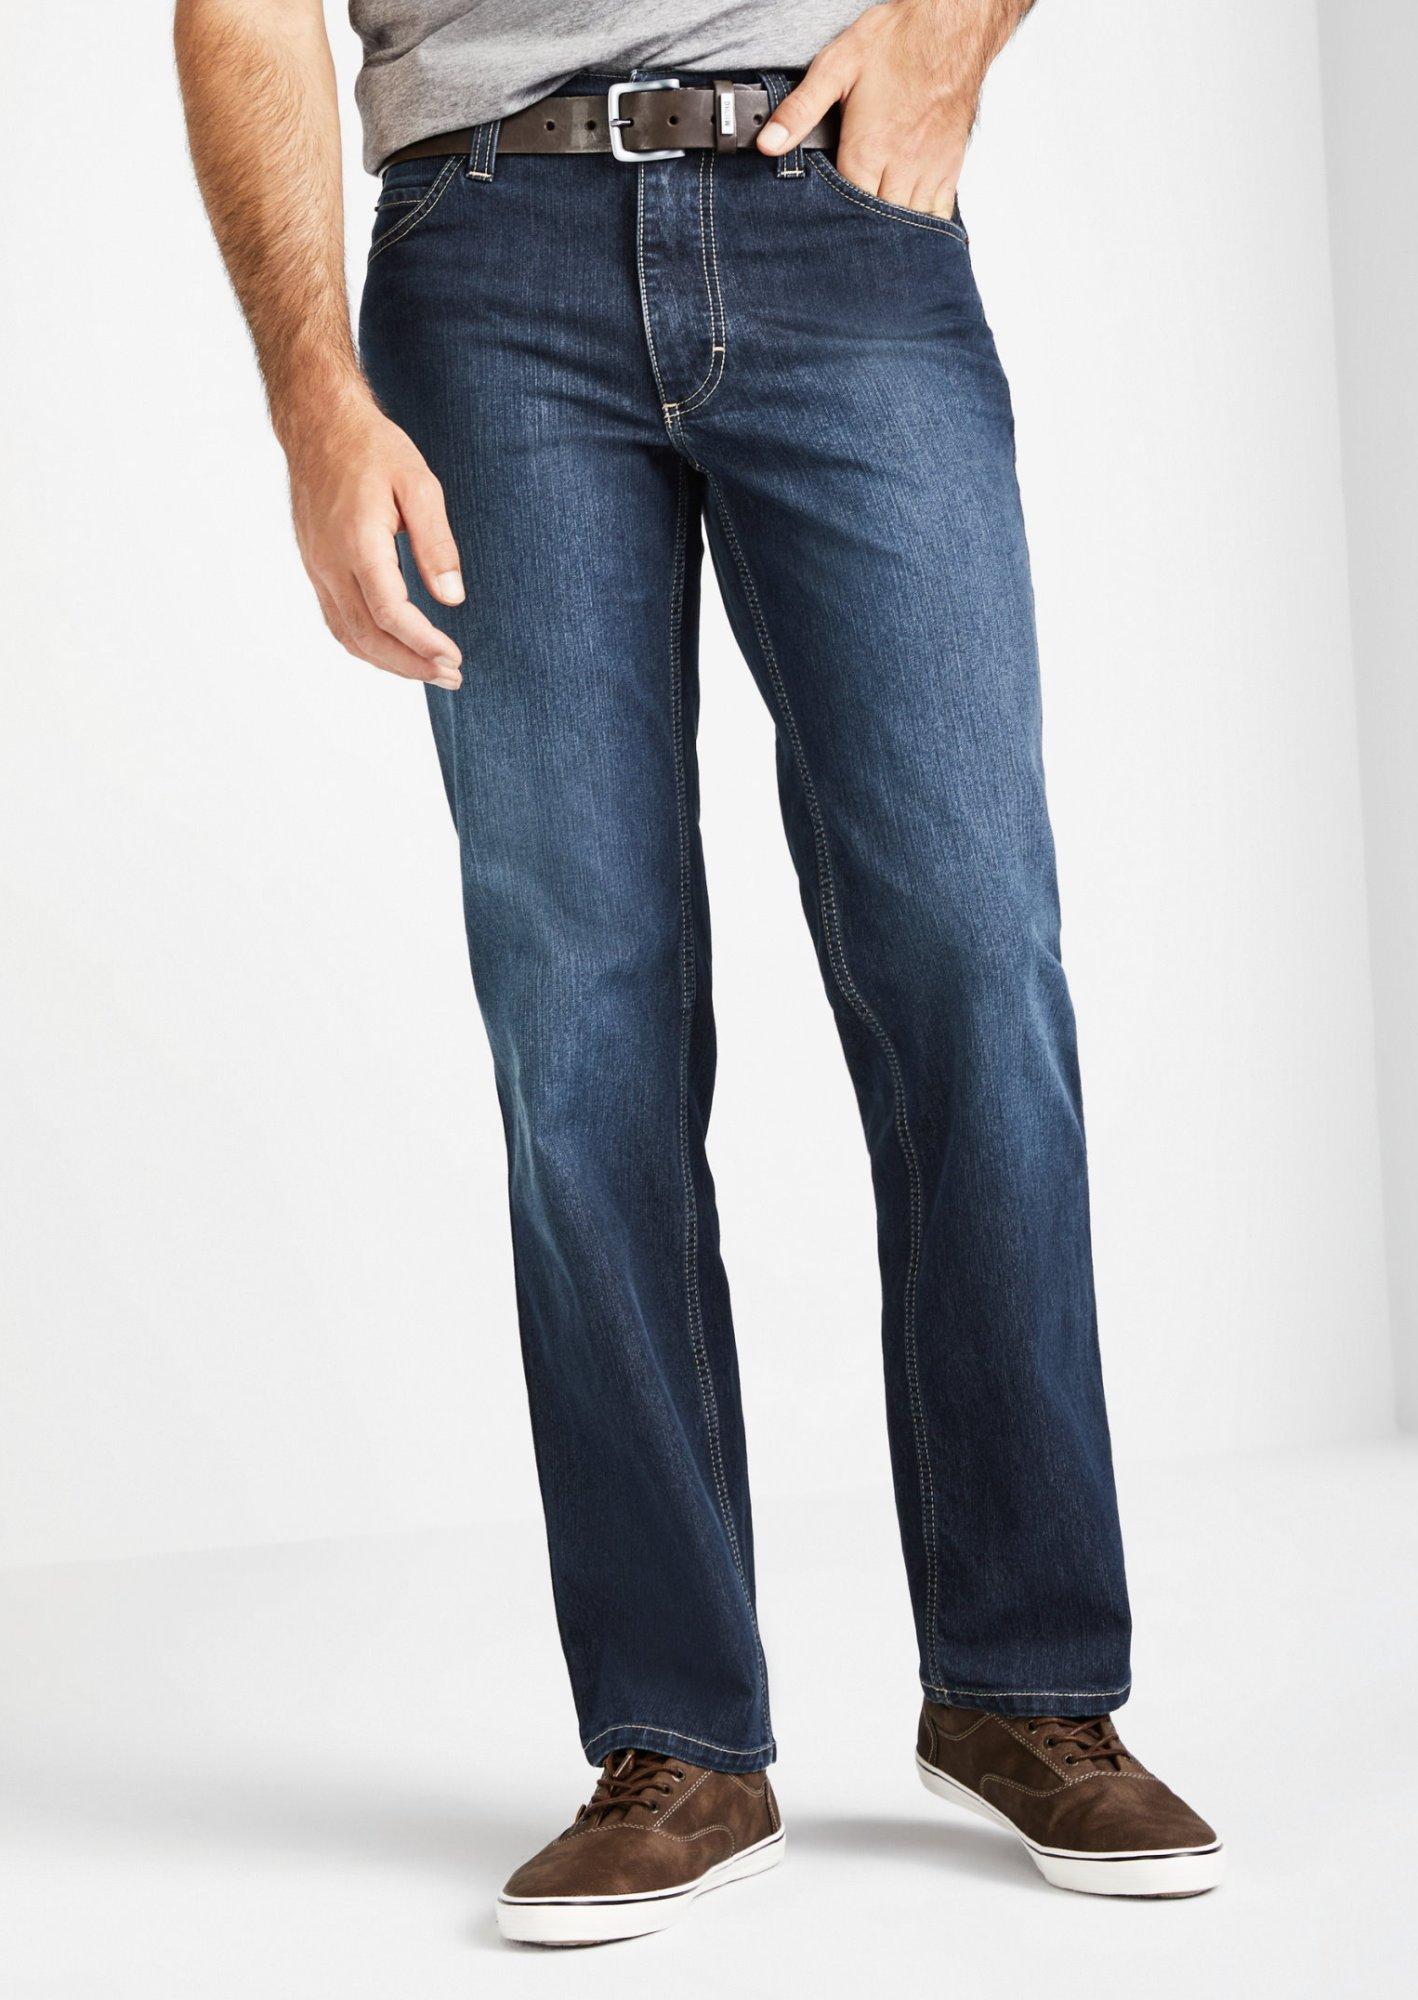 Mustang Tramper Men/'s Jeans W28 to W46//Midnight Black Stretch